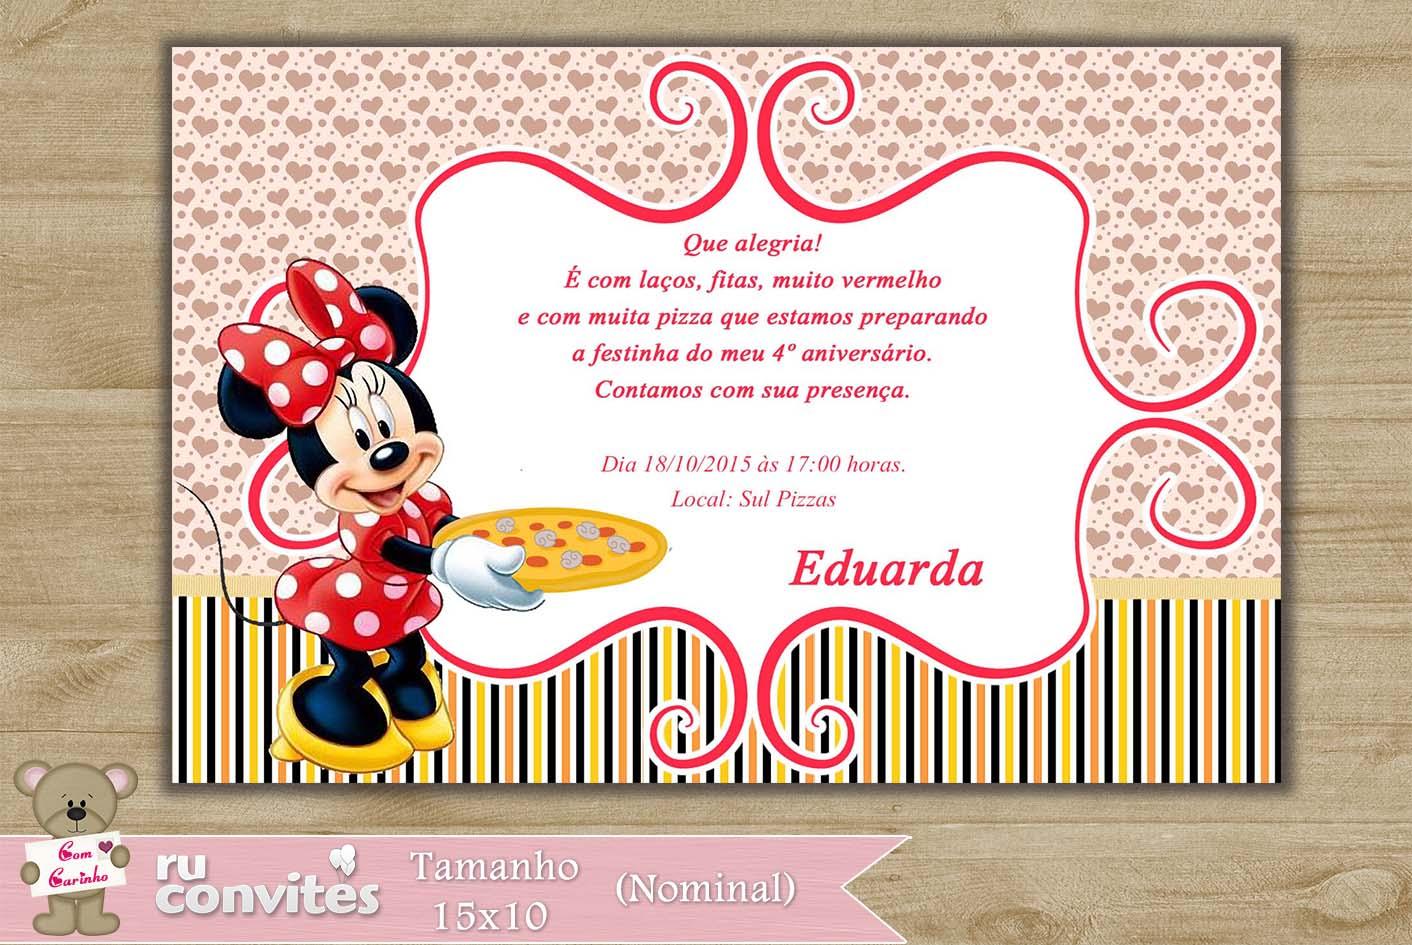 Convite Minnie 540 No Elo7 Ruconvites 4744a9